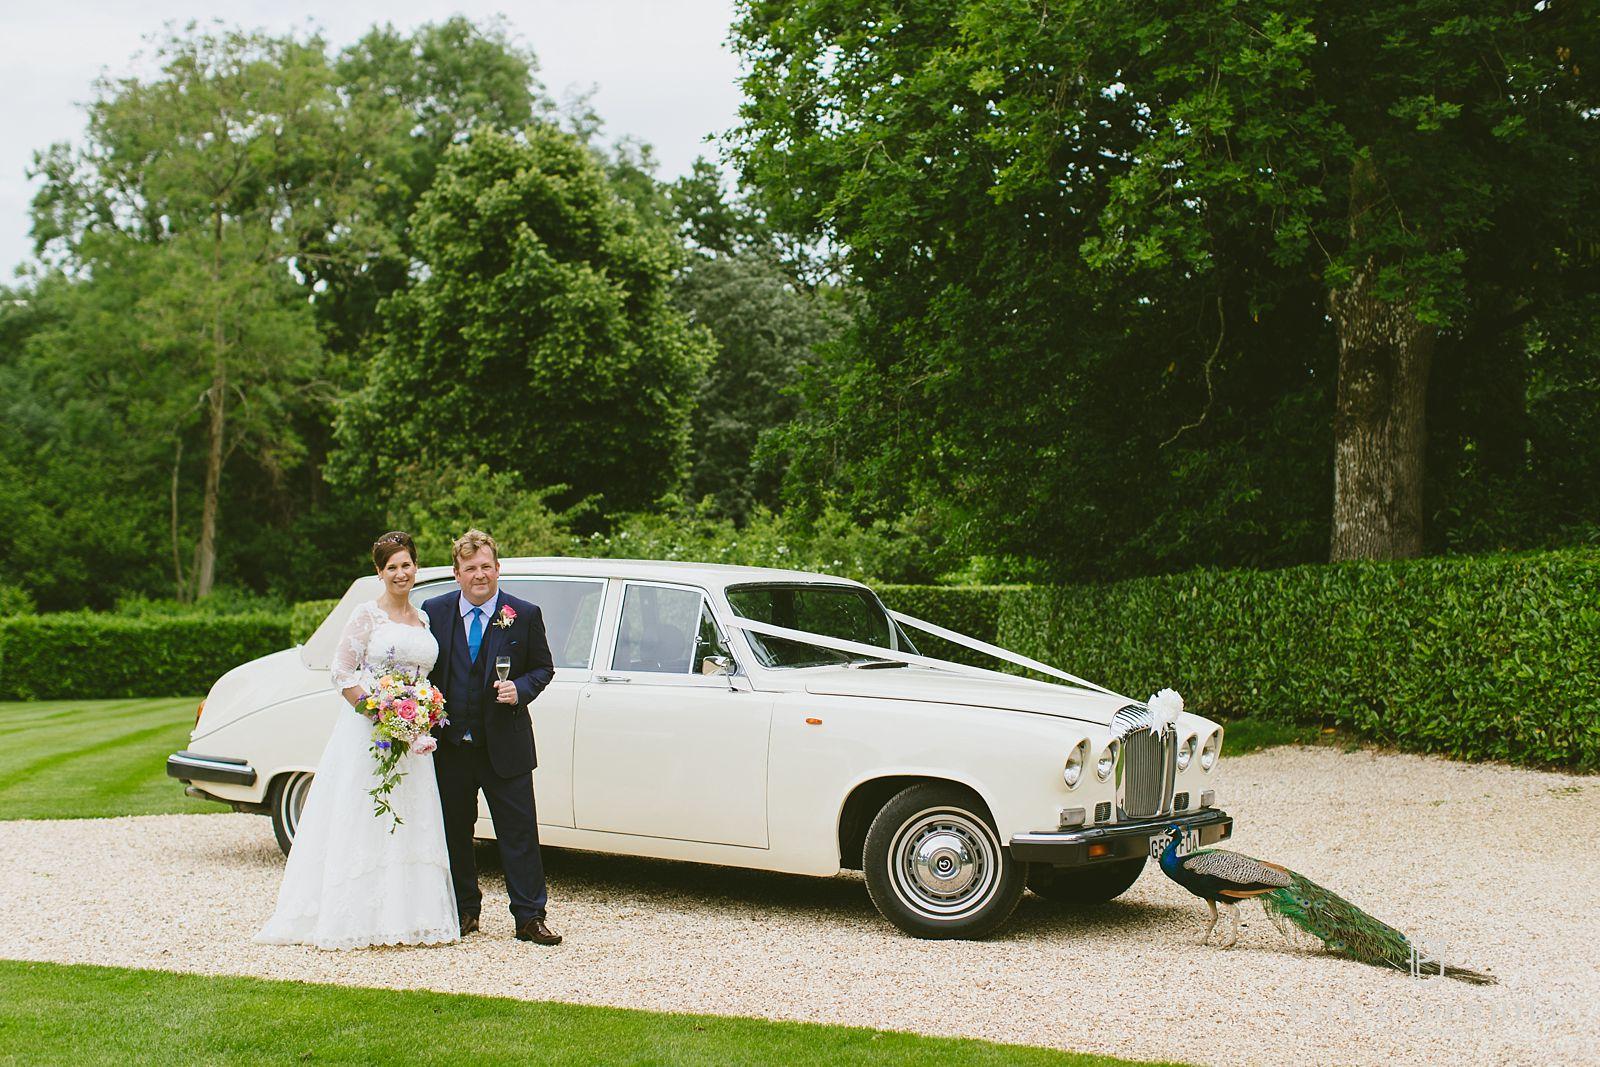 Wedding car bride and groom portrait